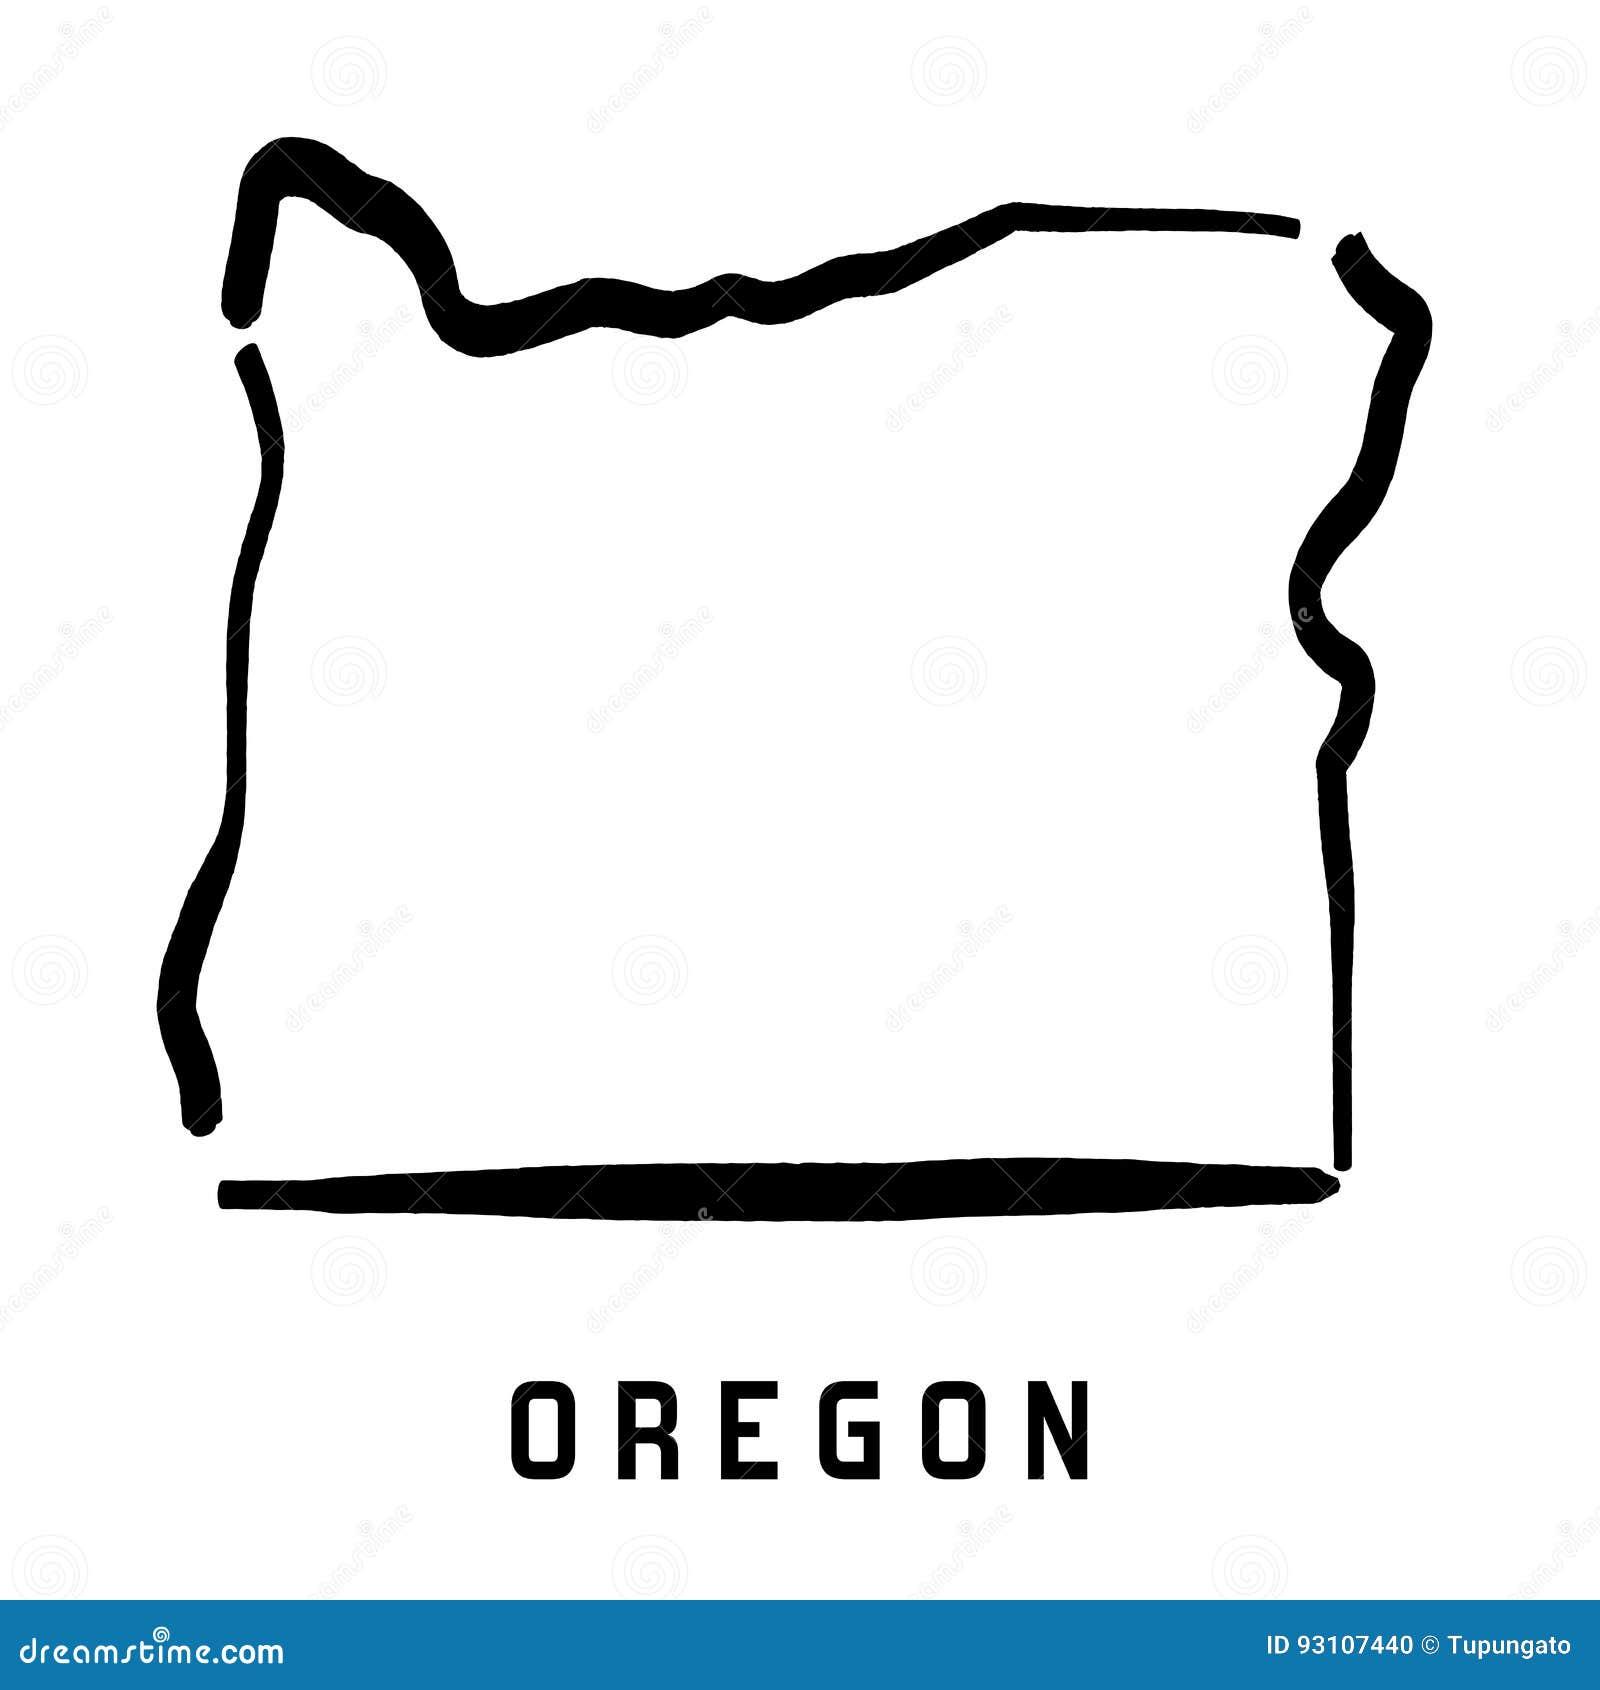 U S State Map Vector.Oregon Stock Vector Illustration Of America Shape Conceptual